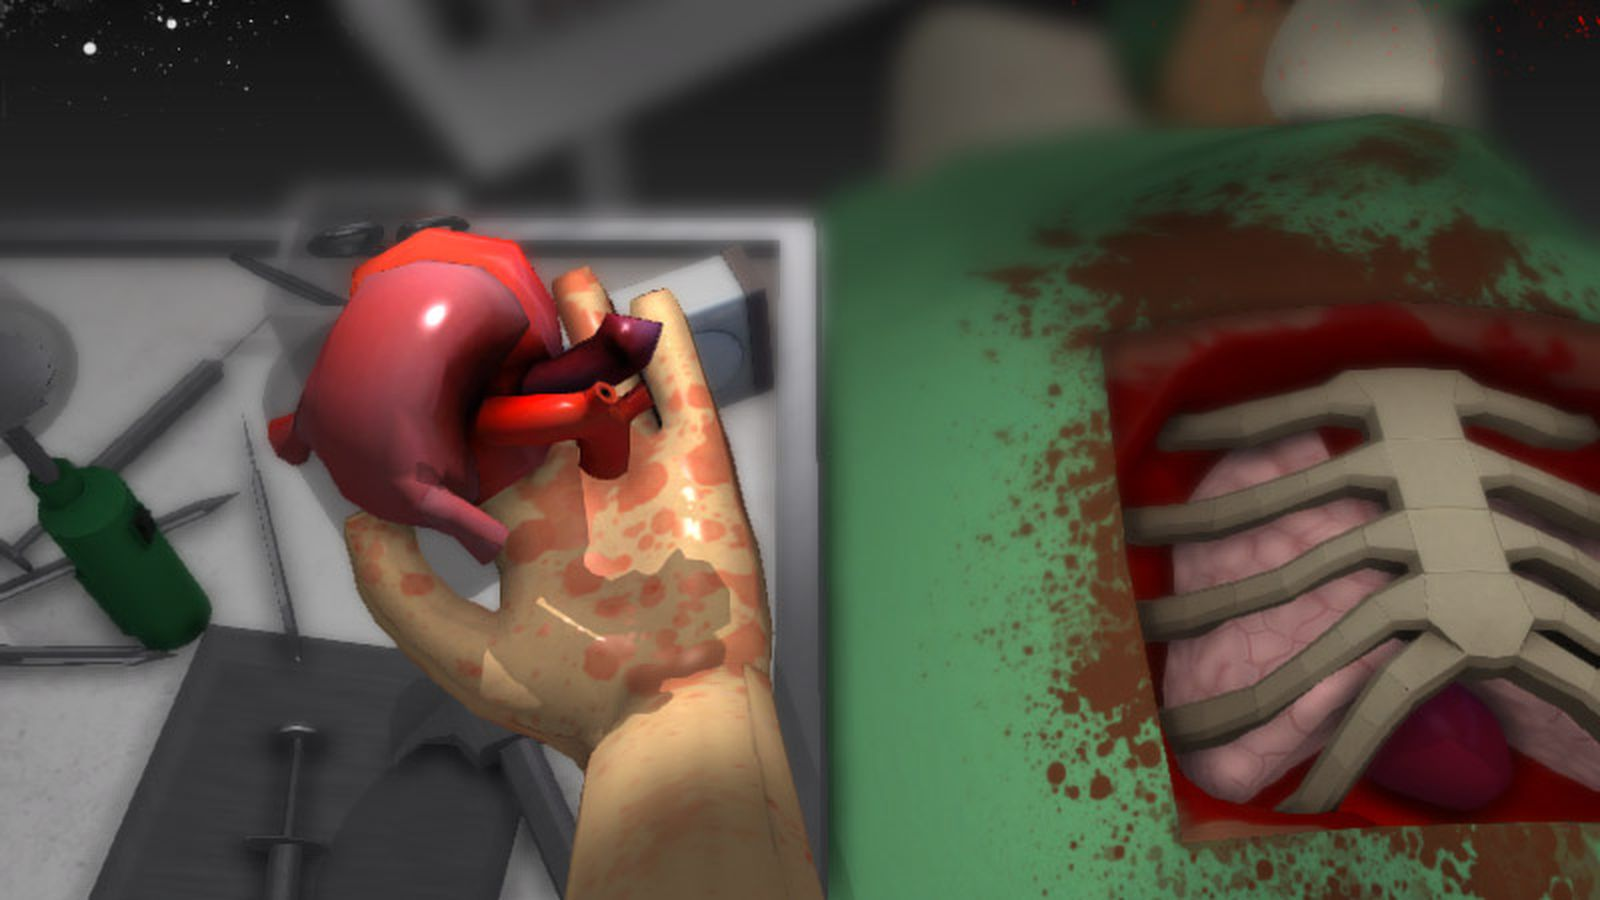 surgeon simulator 2013 brings qwop style awkwardness to heart